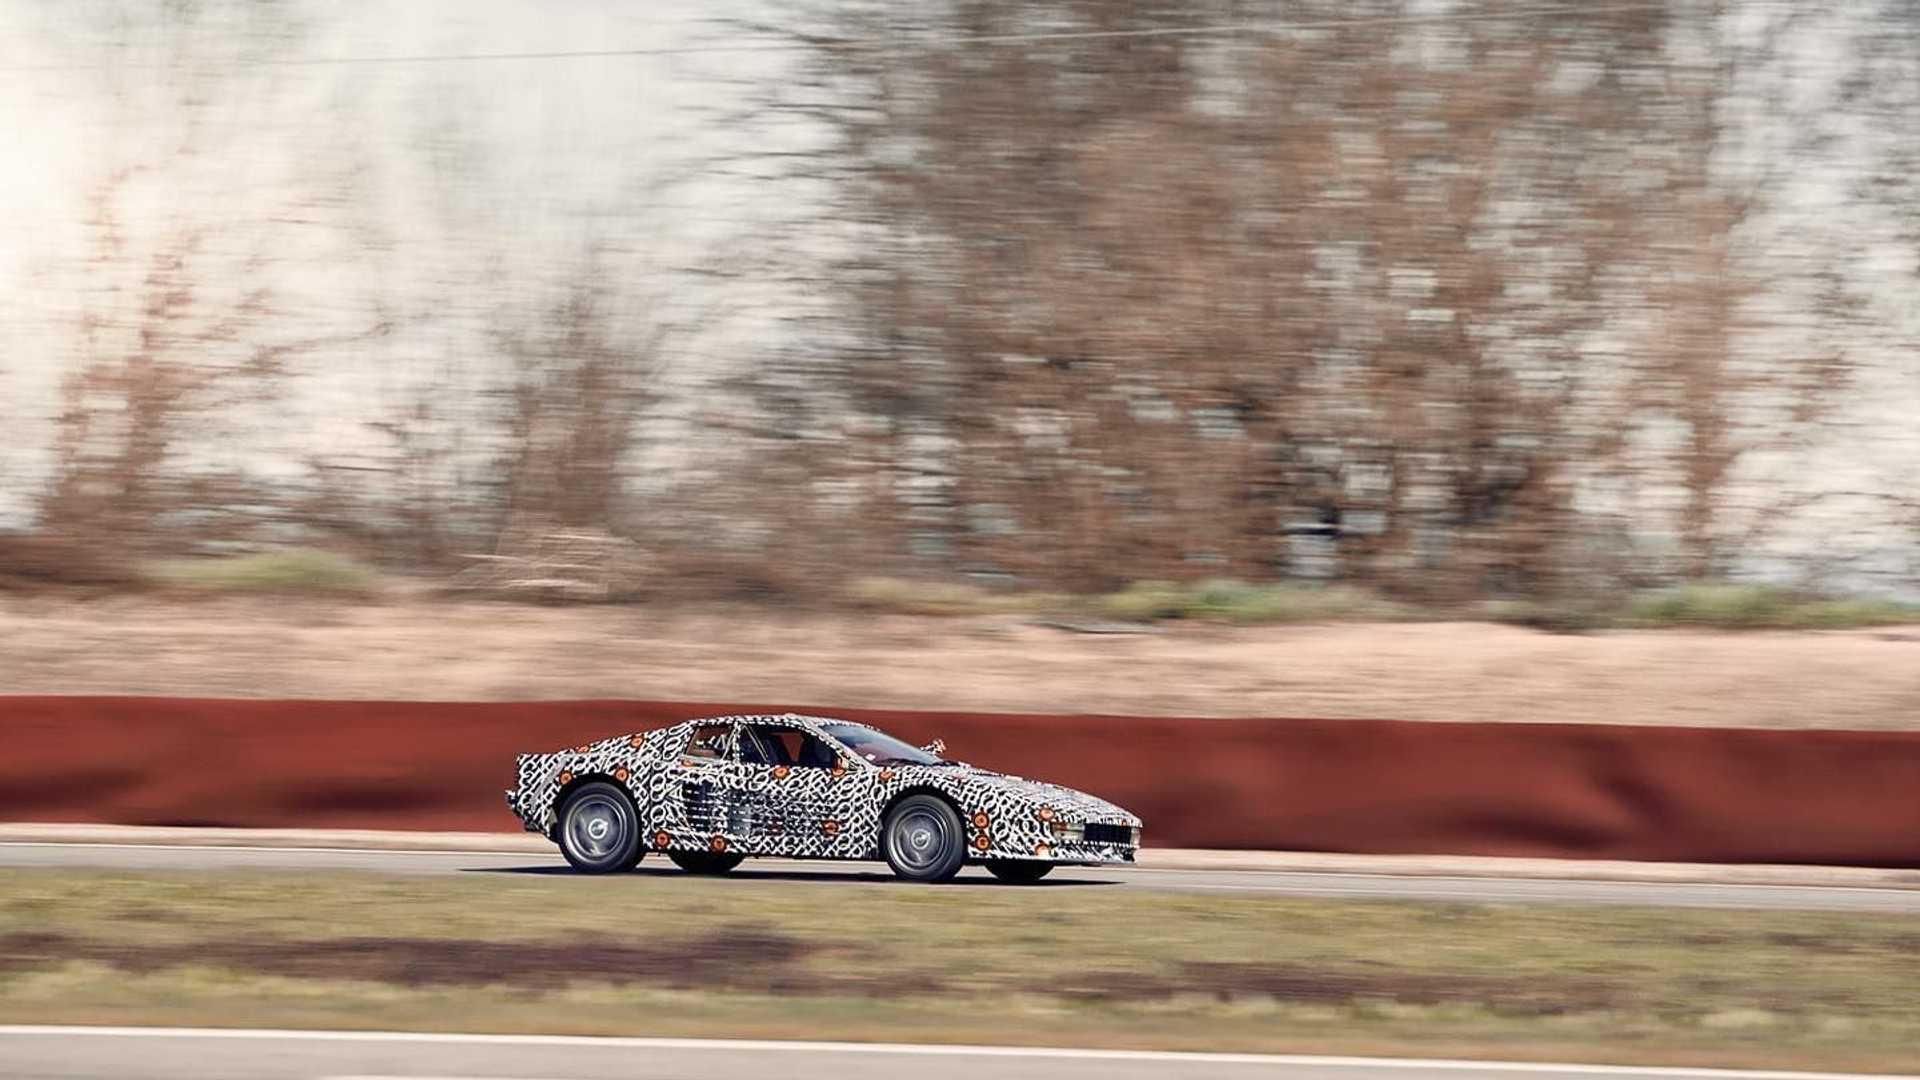 Ferrari-Testarossa-restomod-by-Officine-Fioravanti-1